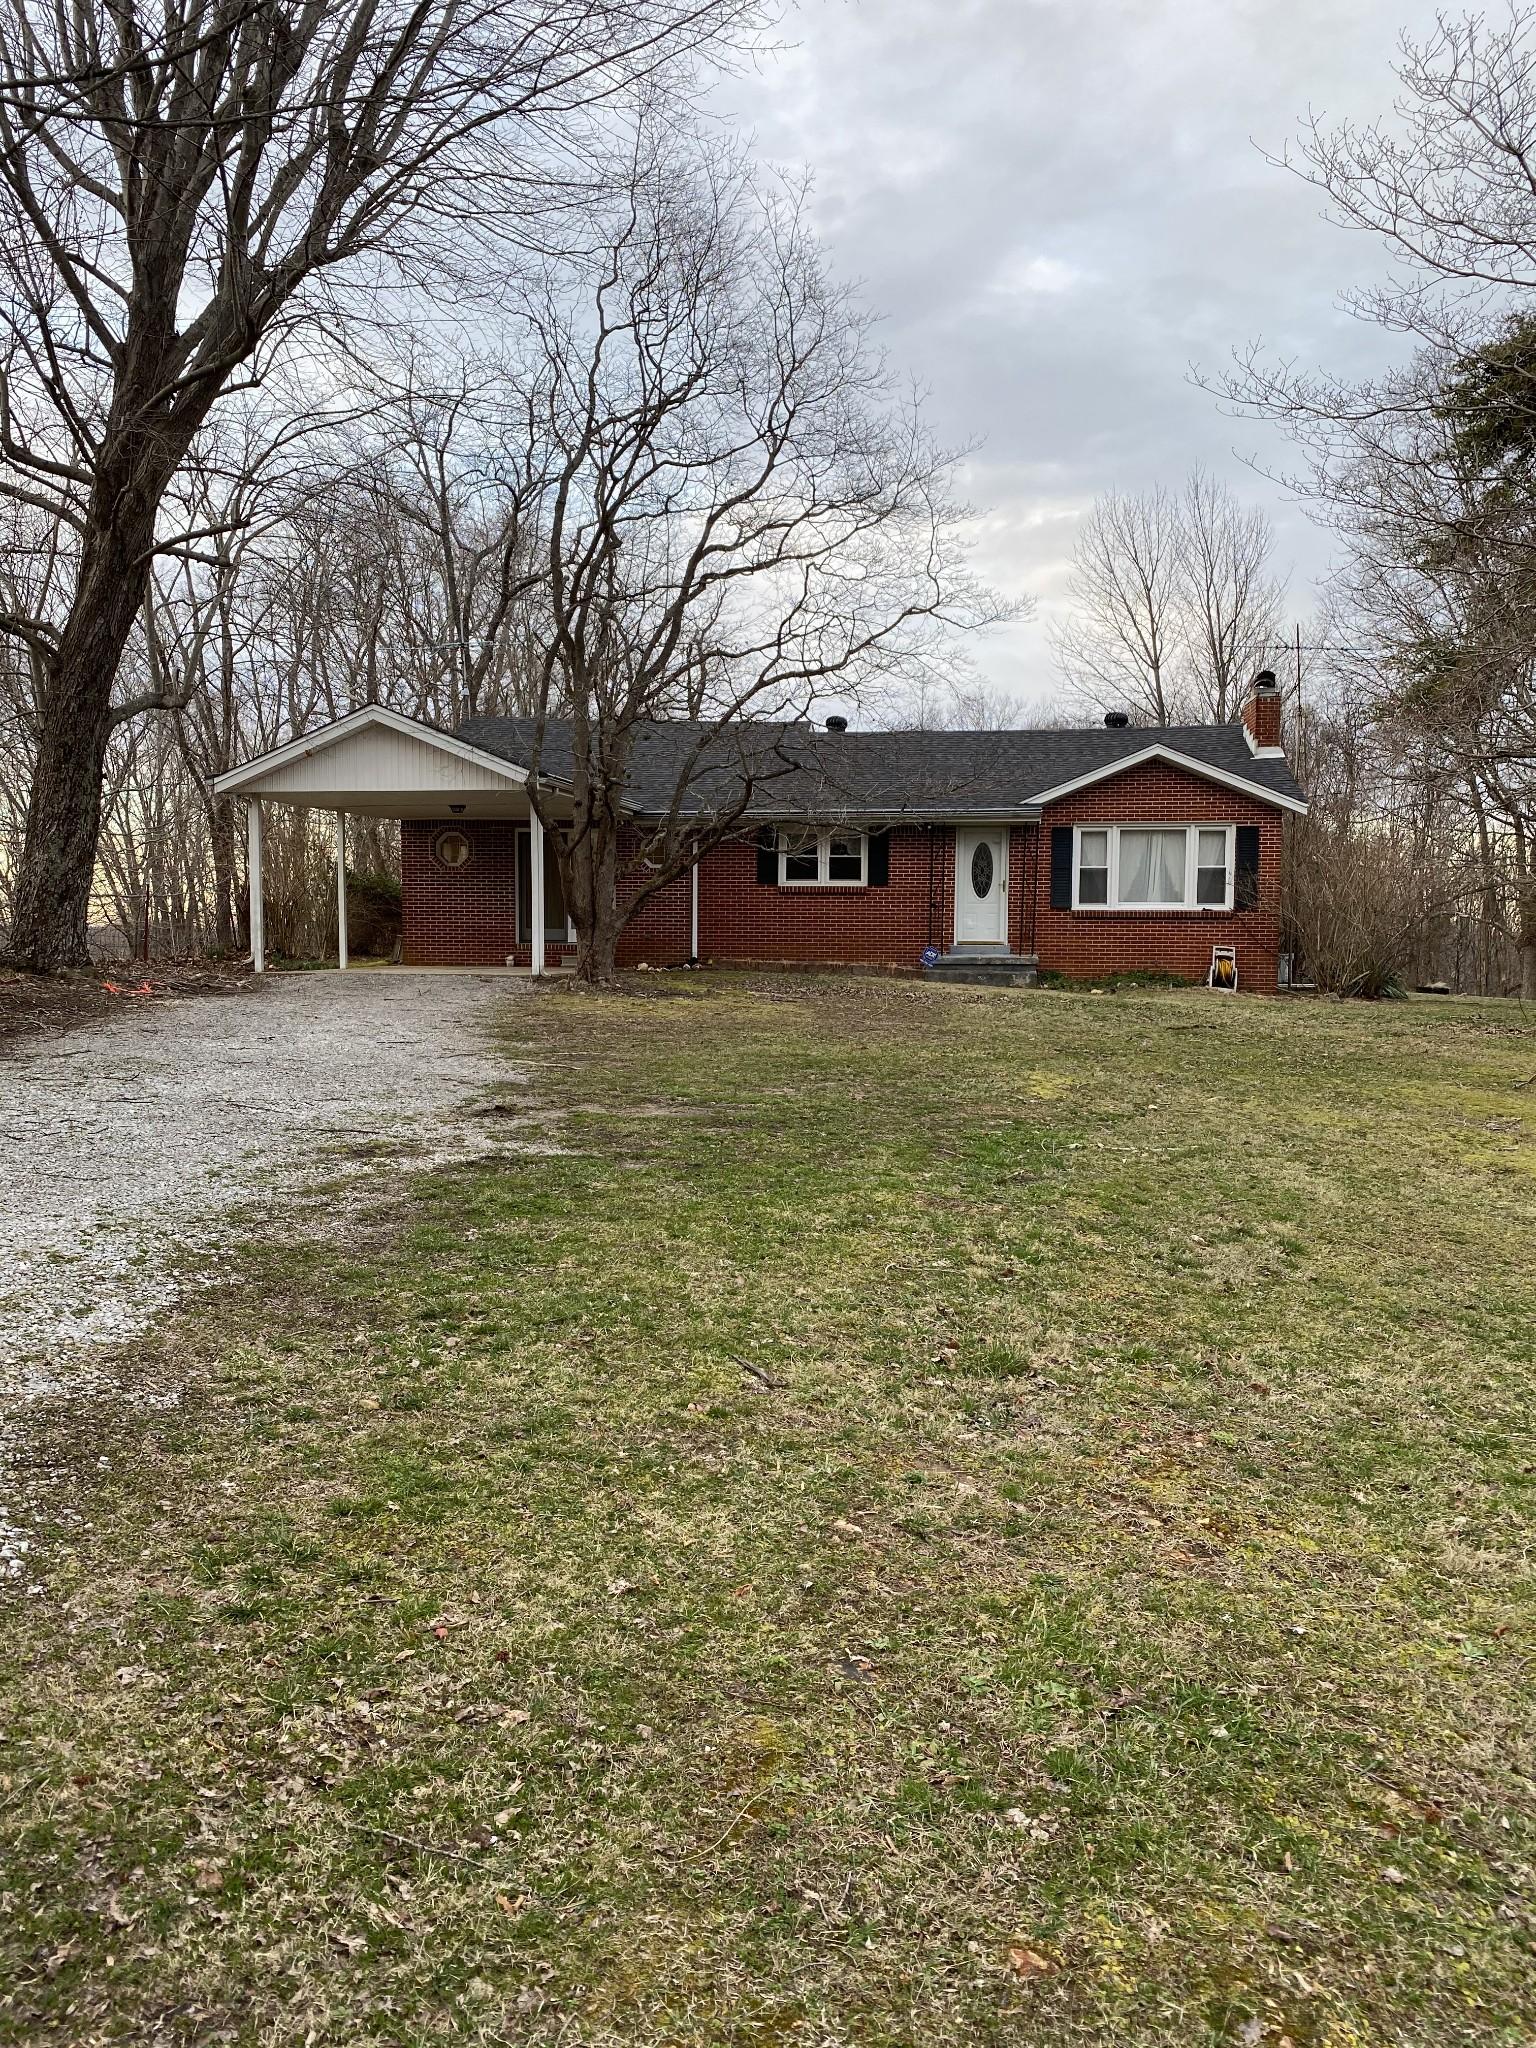 13 Wilma Ln Property Photo - Chestnut Mound, TN real estate listing